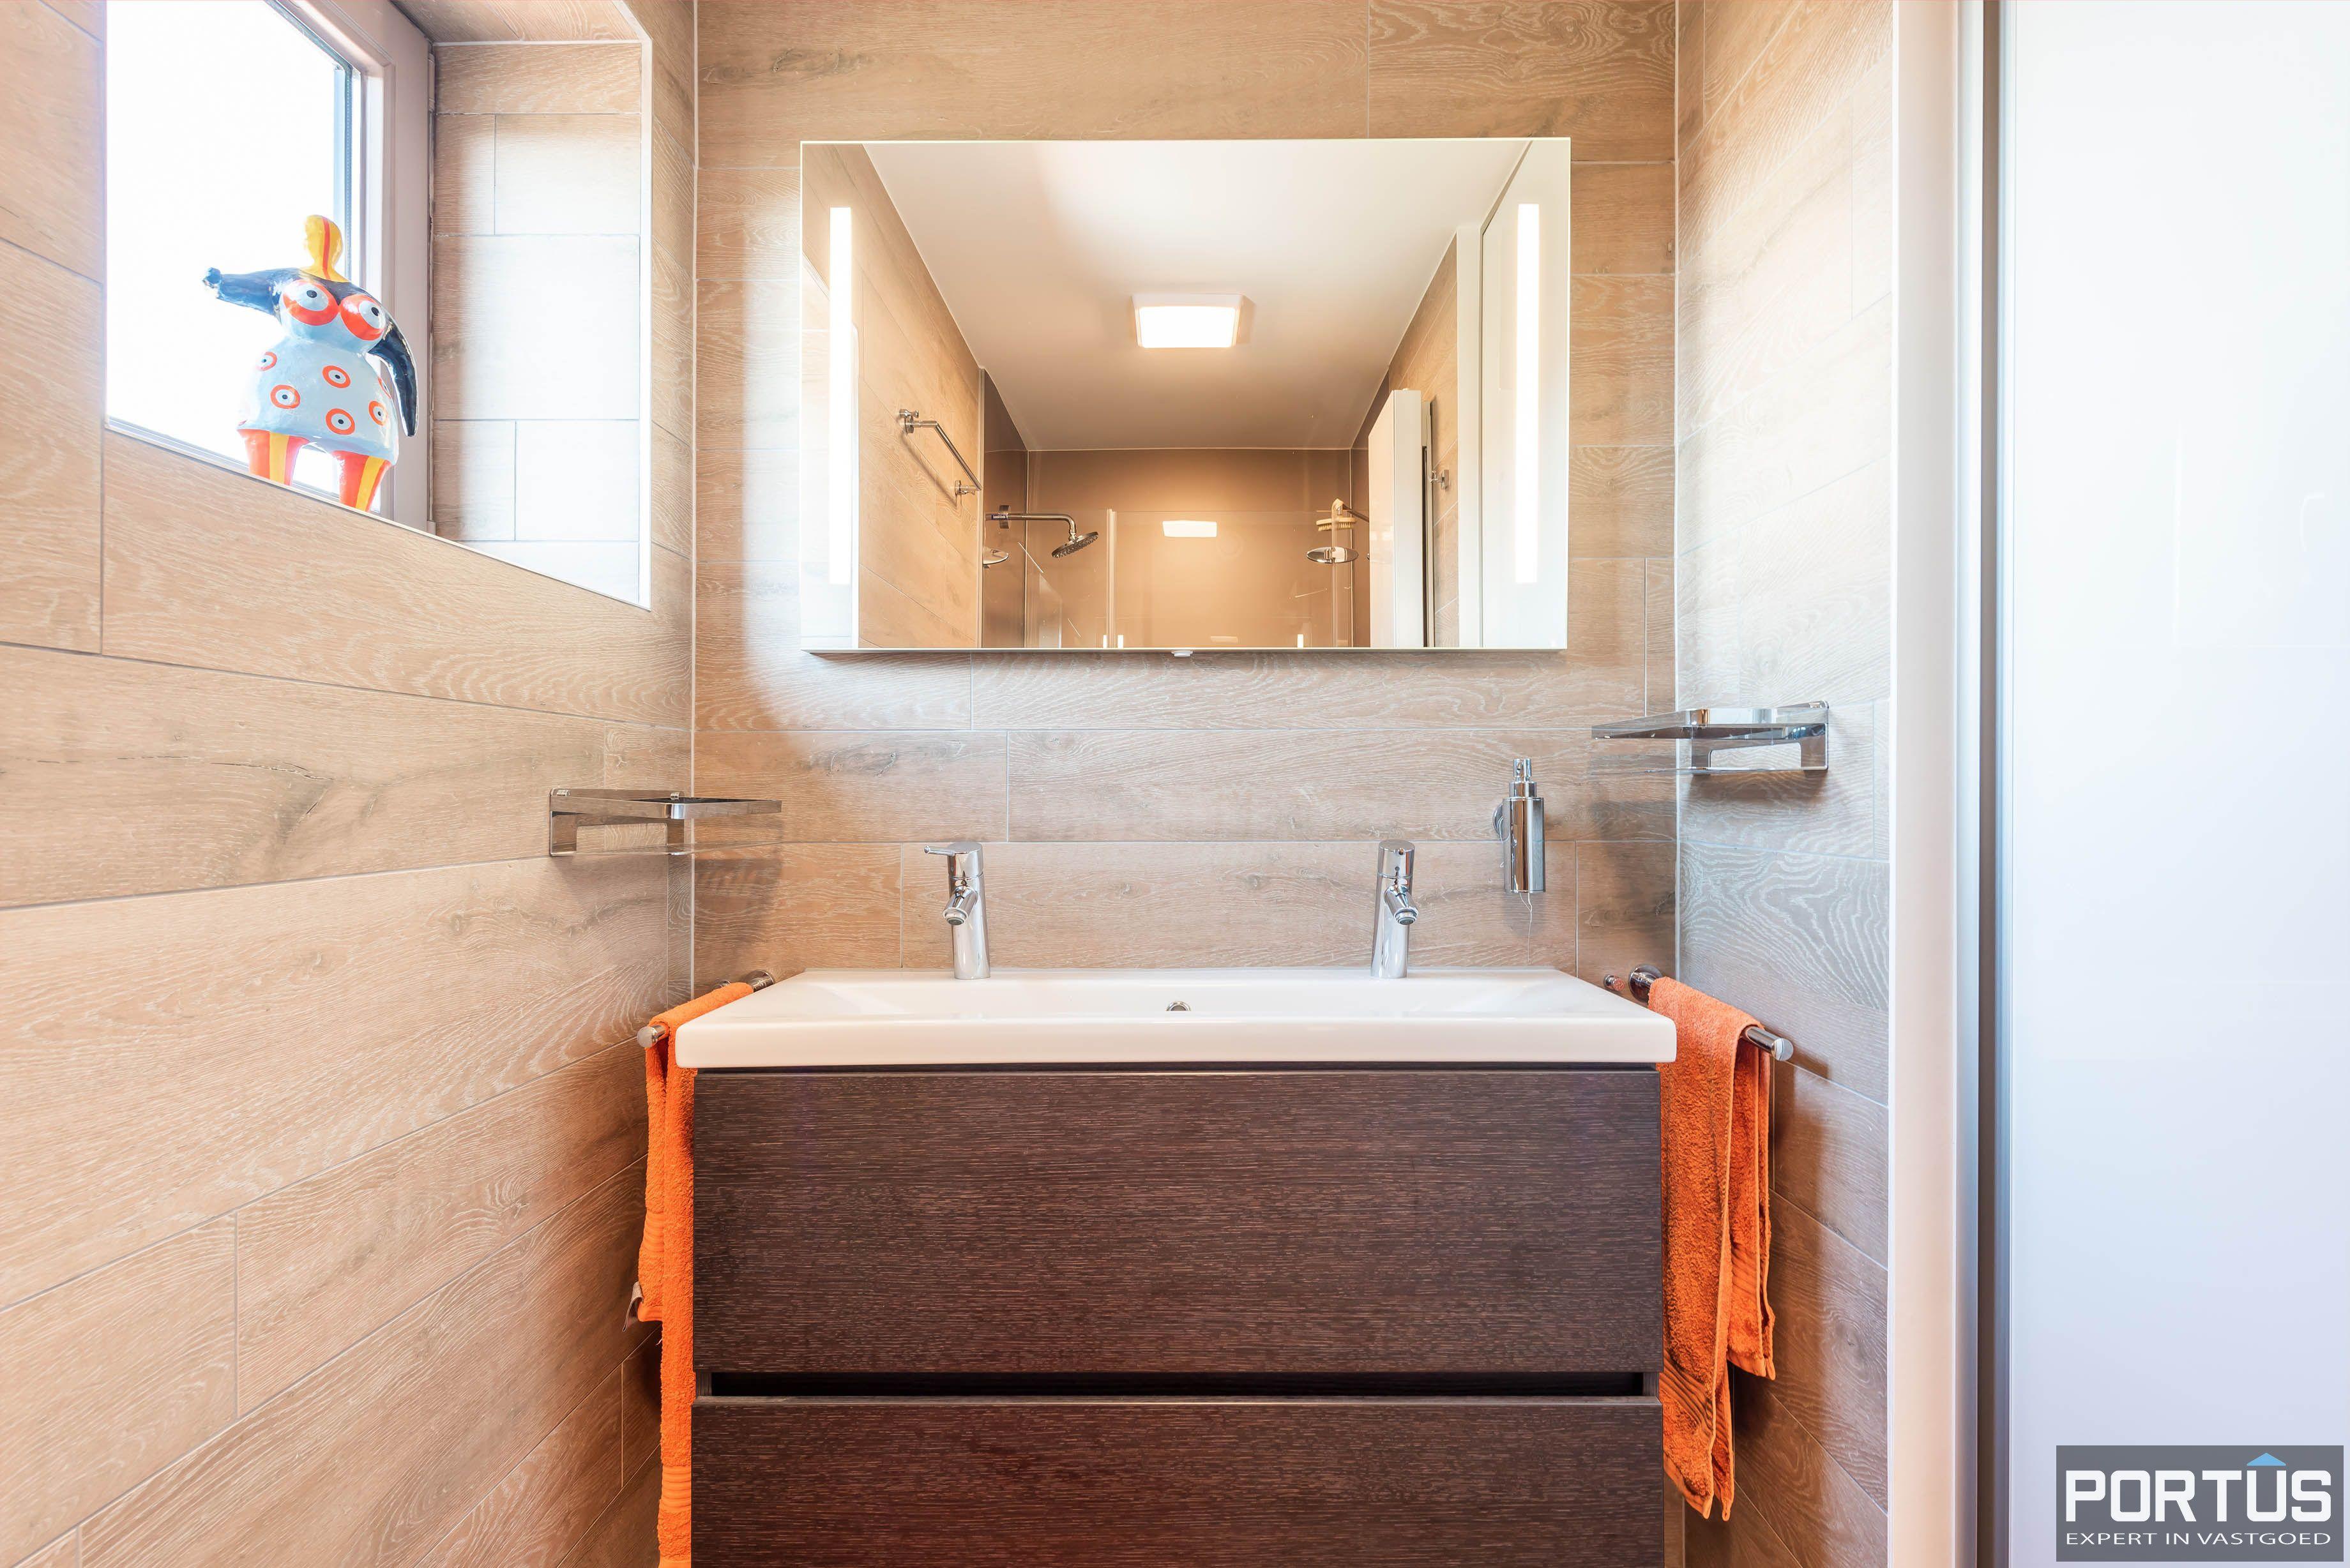 Exclusieve penthouse met 3 slaapkamers te koop te Nieuwpoort - 10938